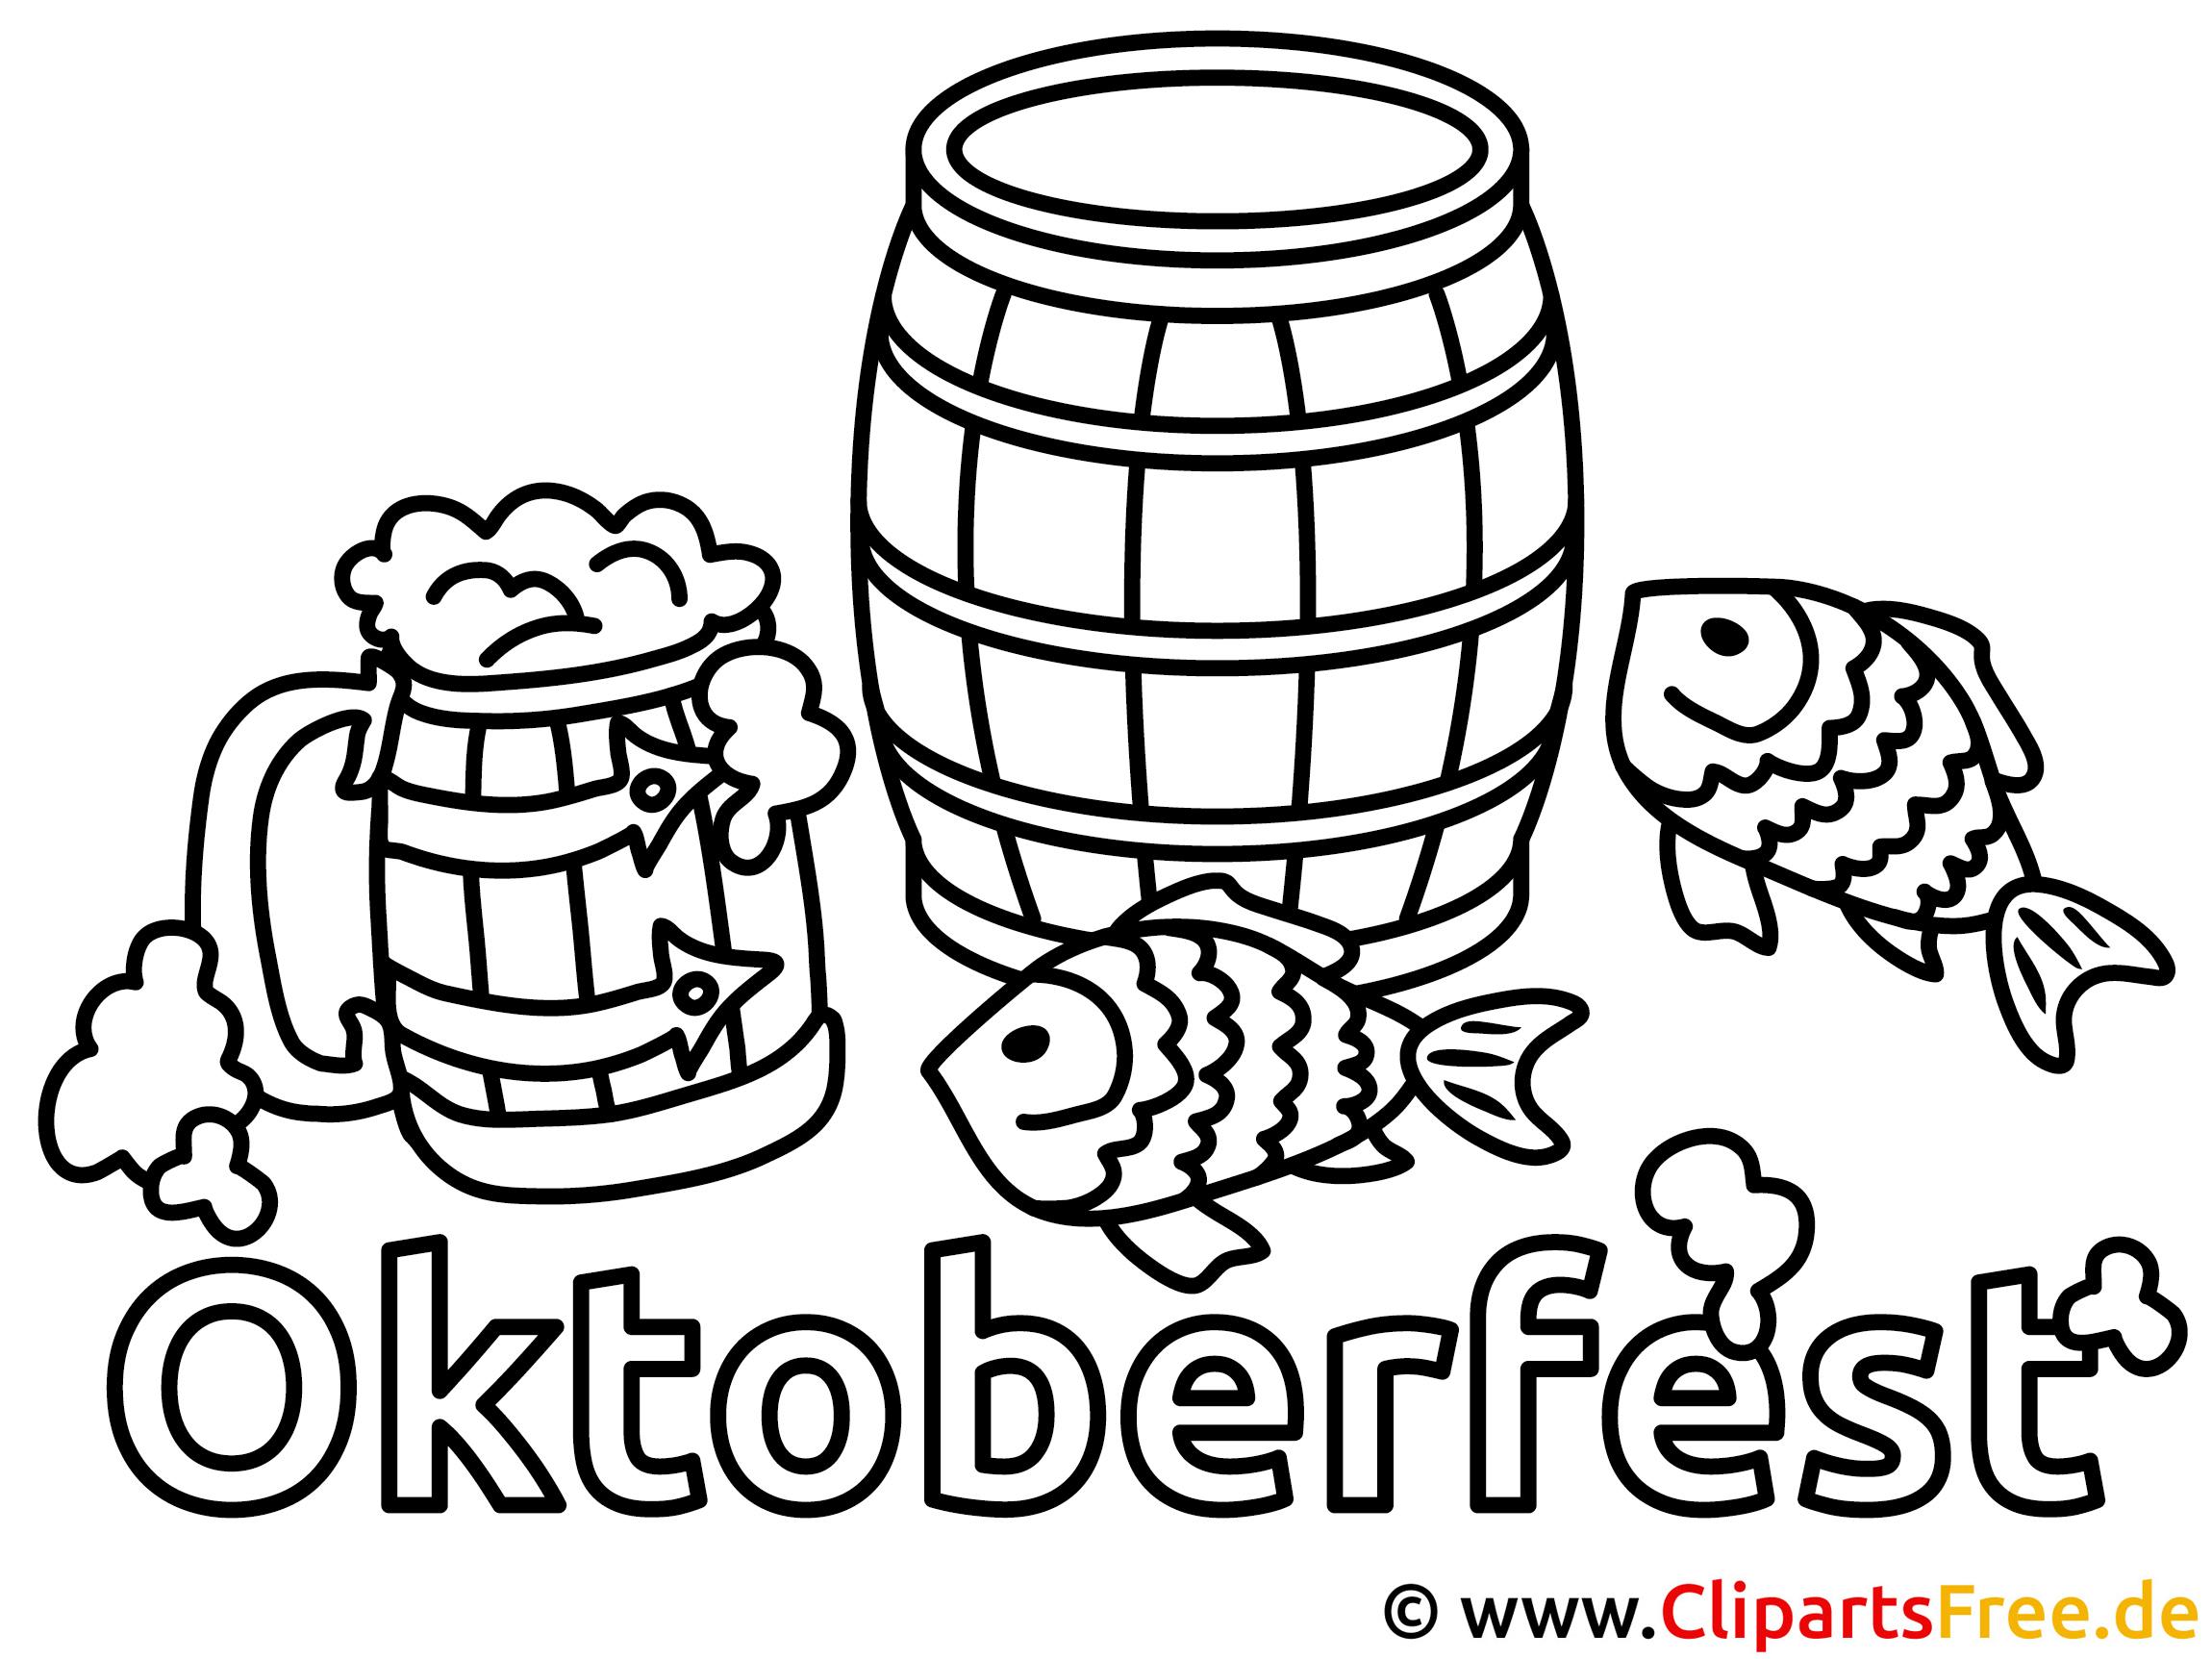 Bier Oktoberfest Ausmalbild